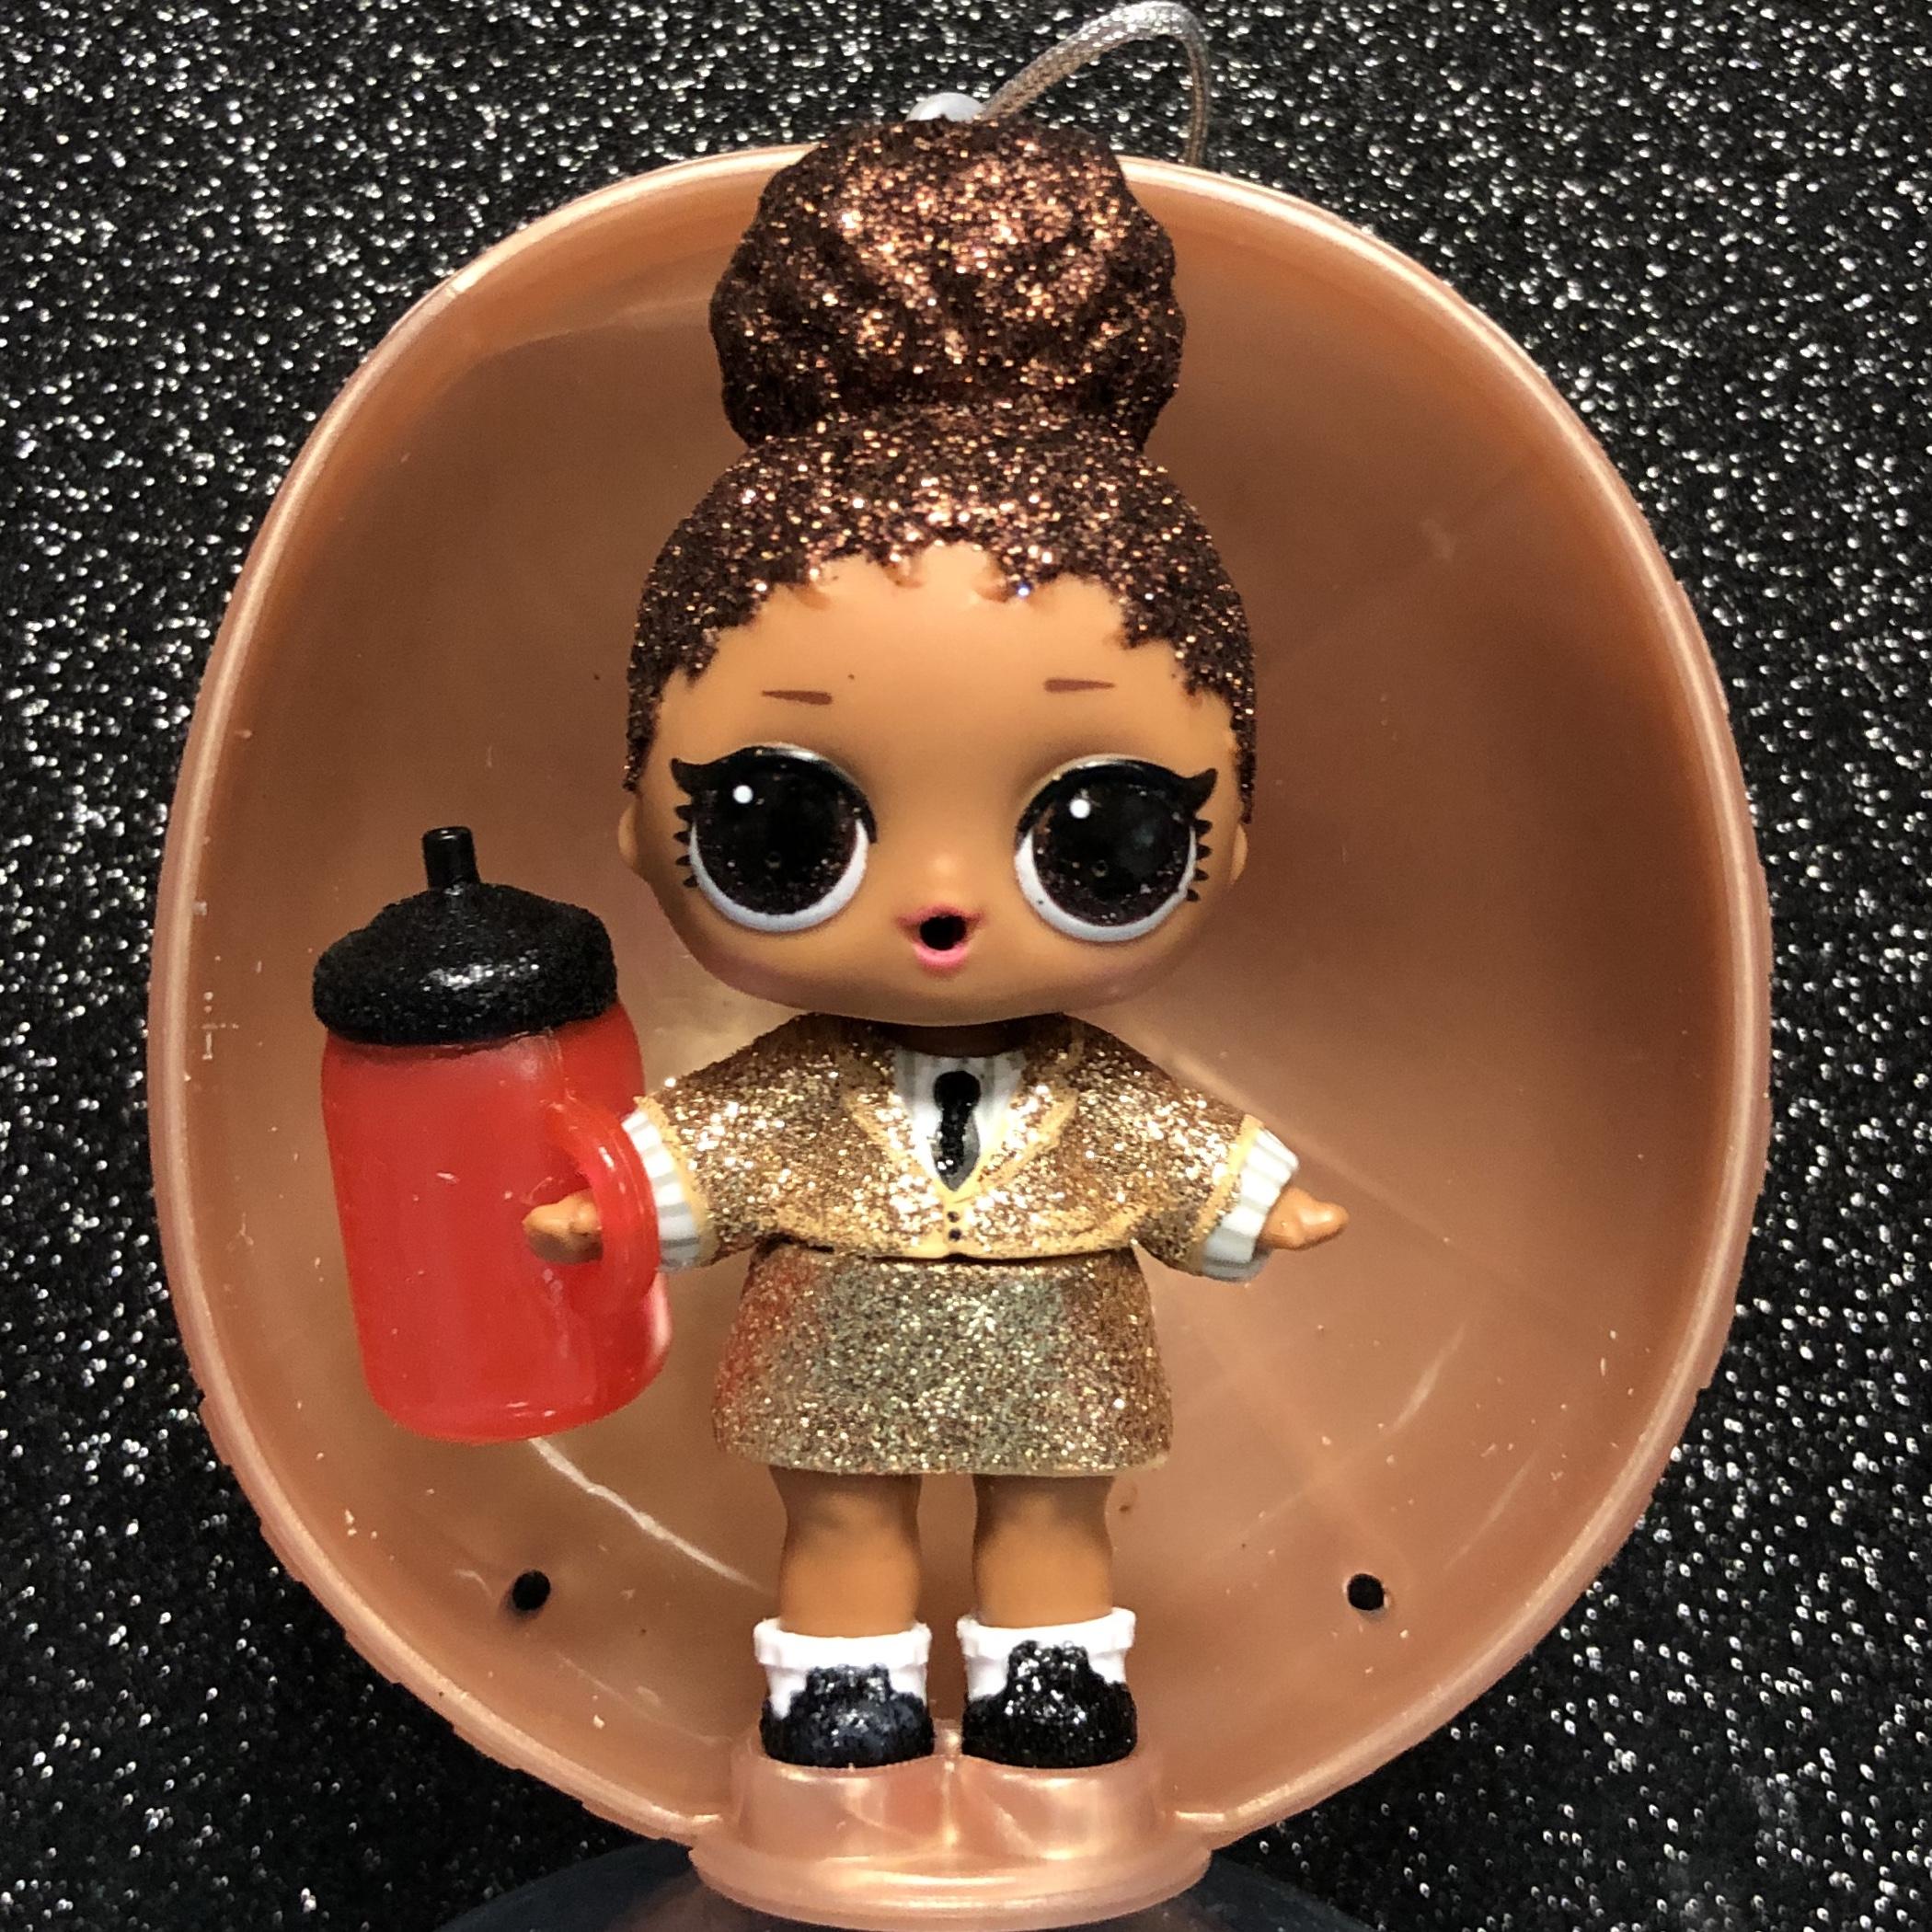 картинки с куклами с блестками для творчества надо